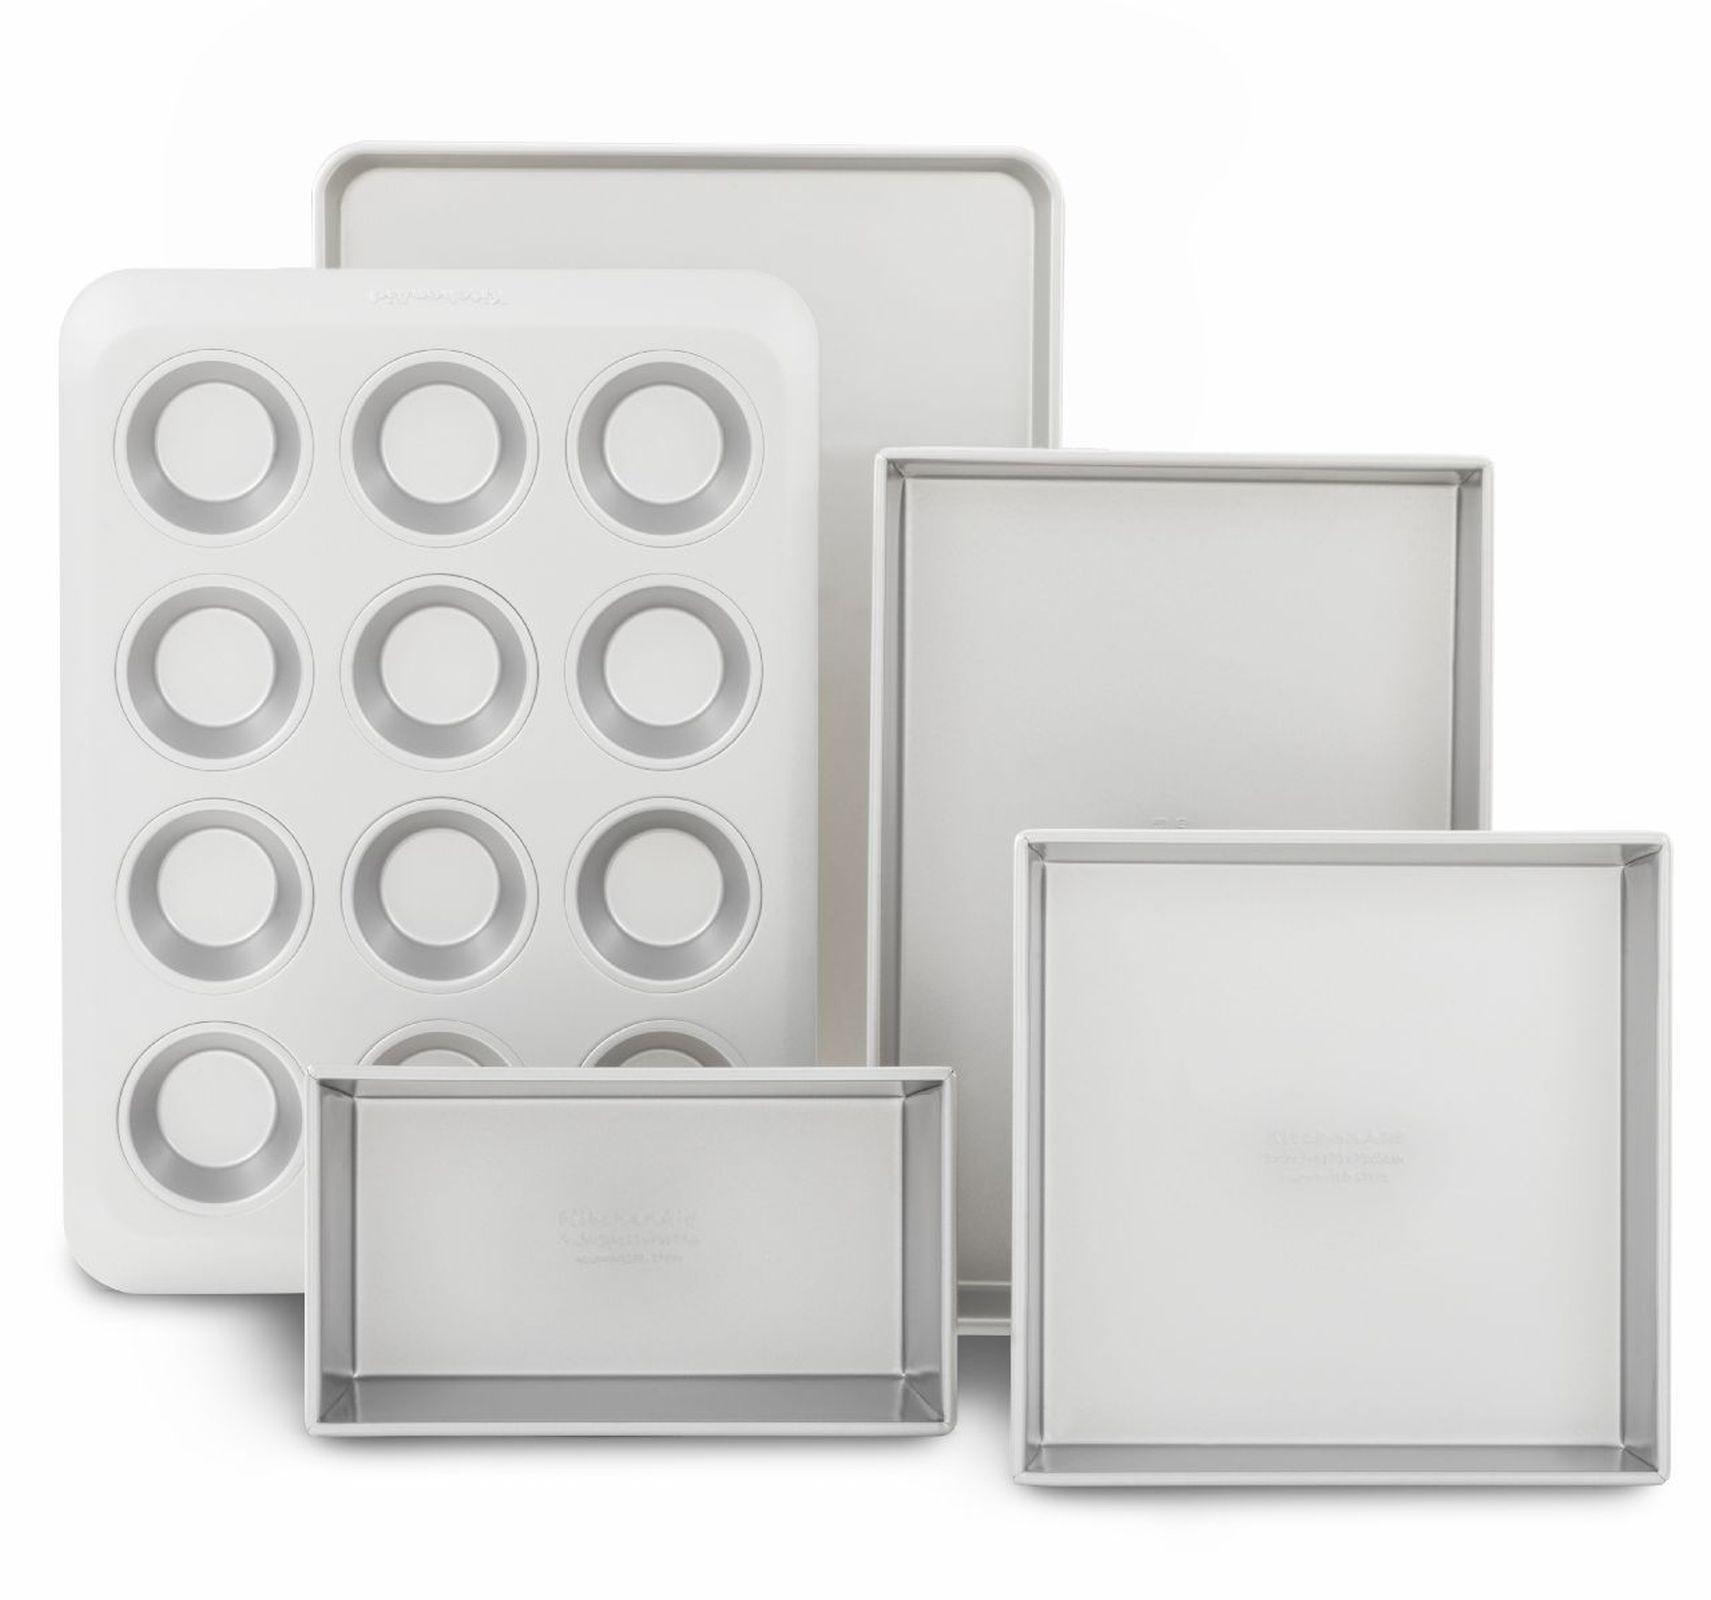 KitchenAid Professional 5-Piece NonStick Bakeware Set